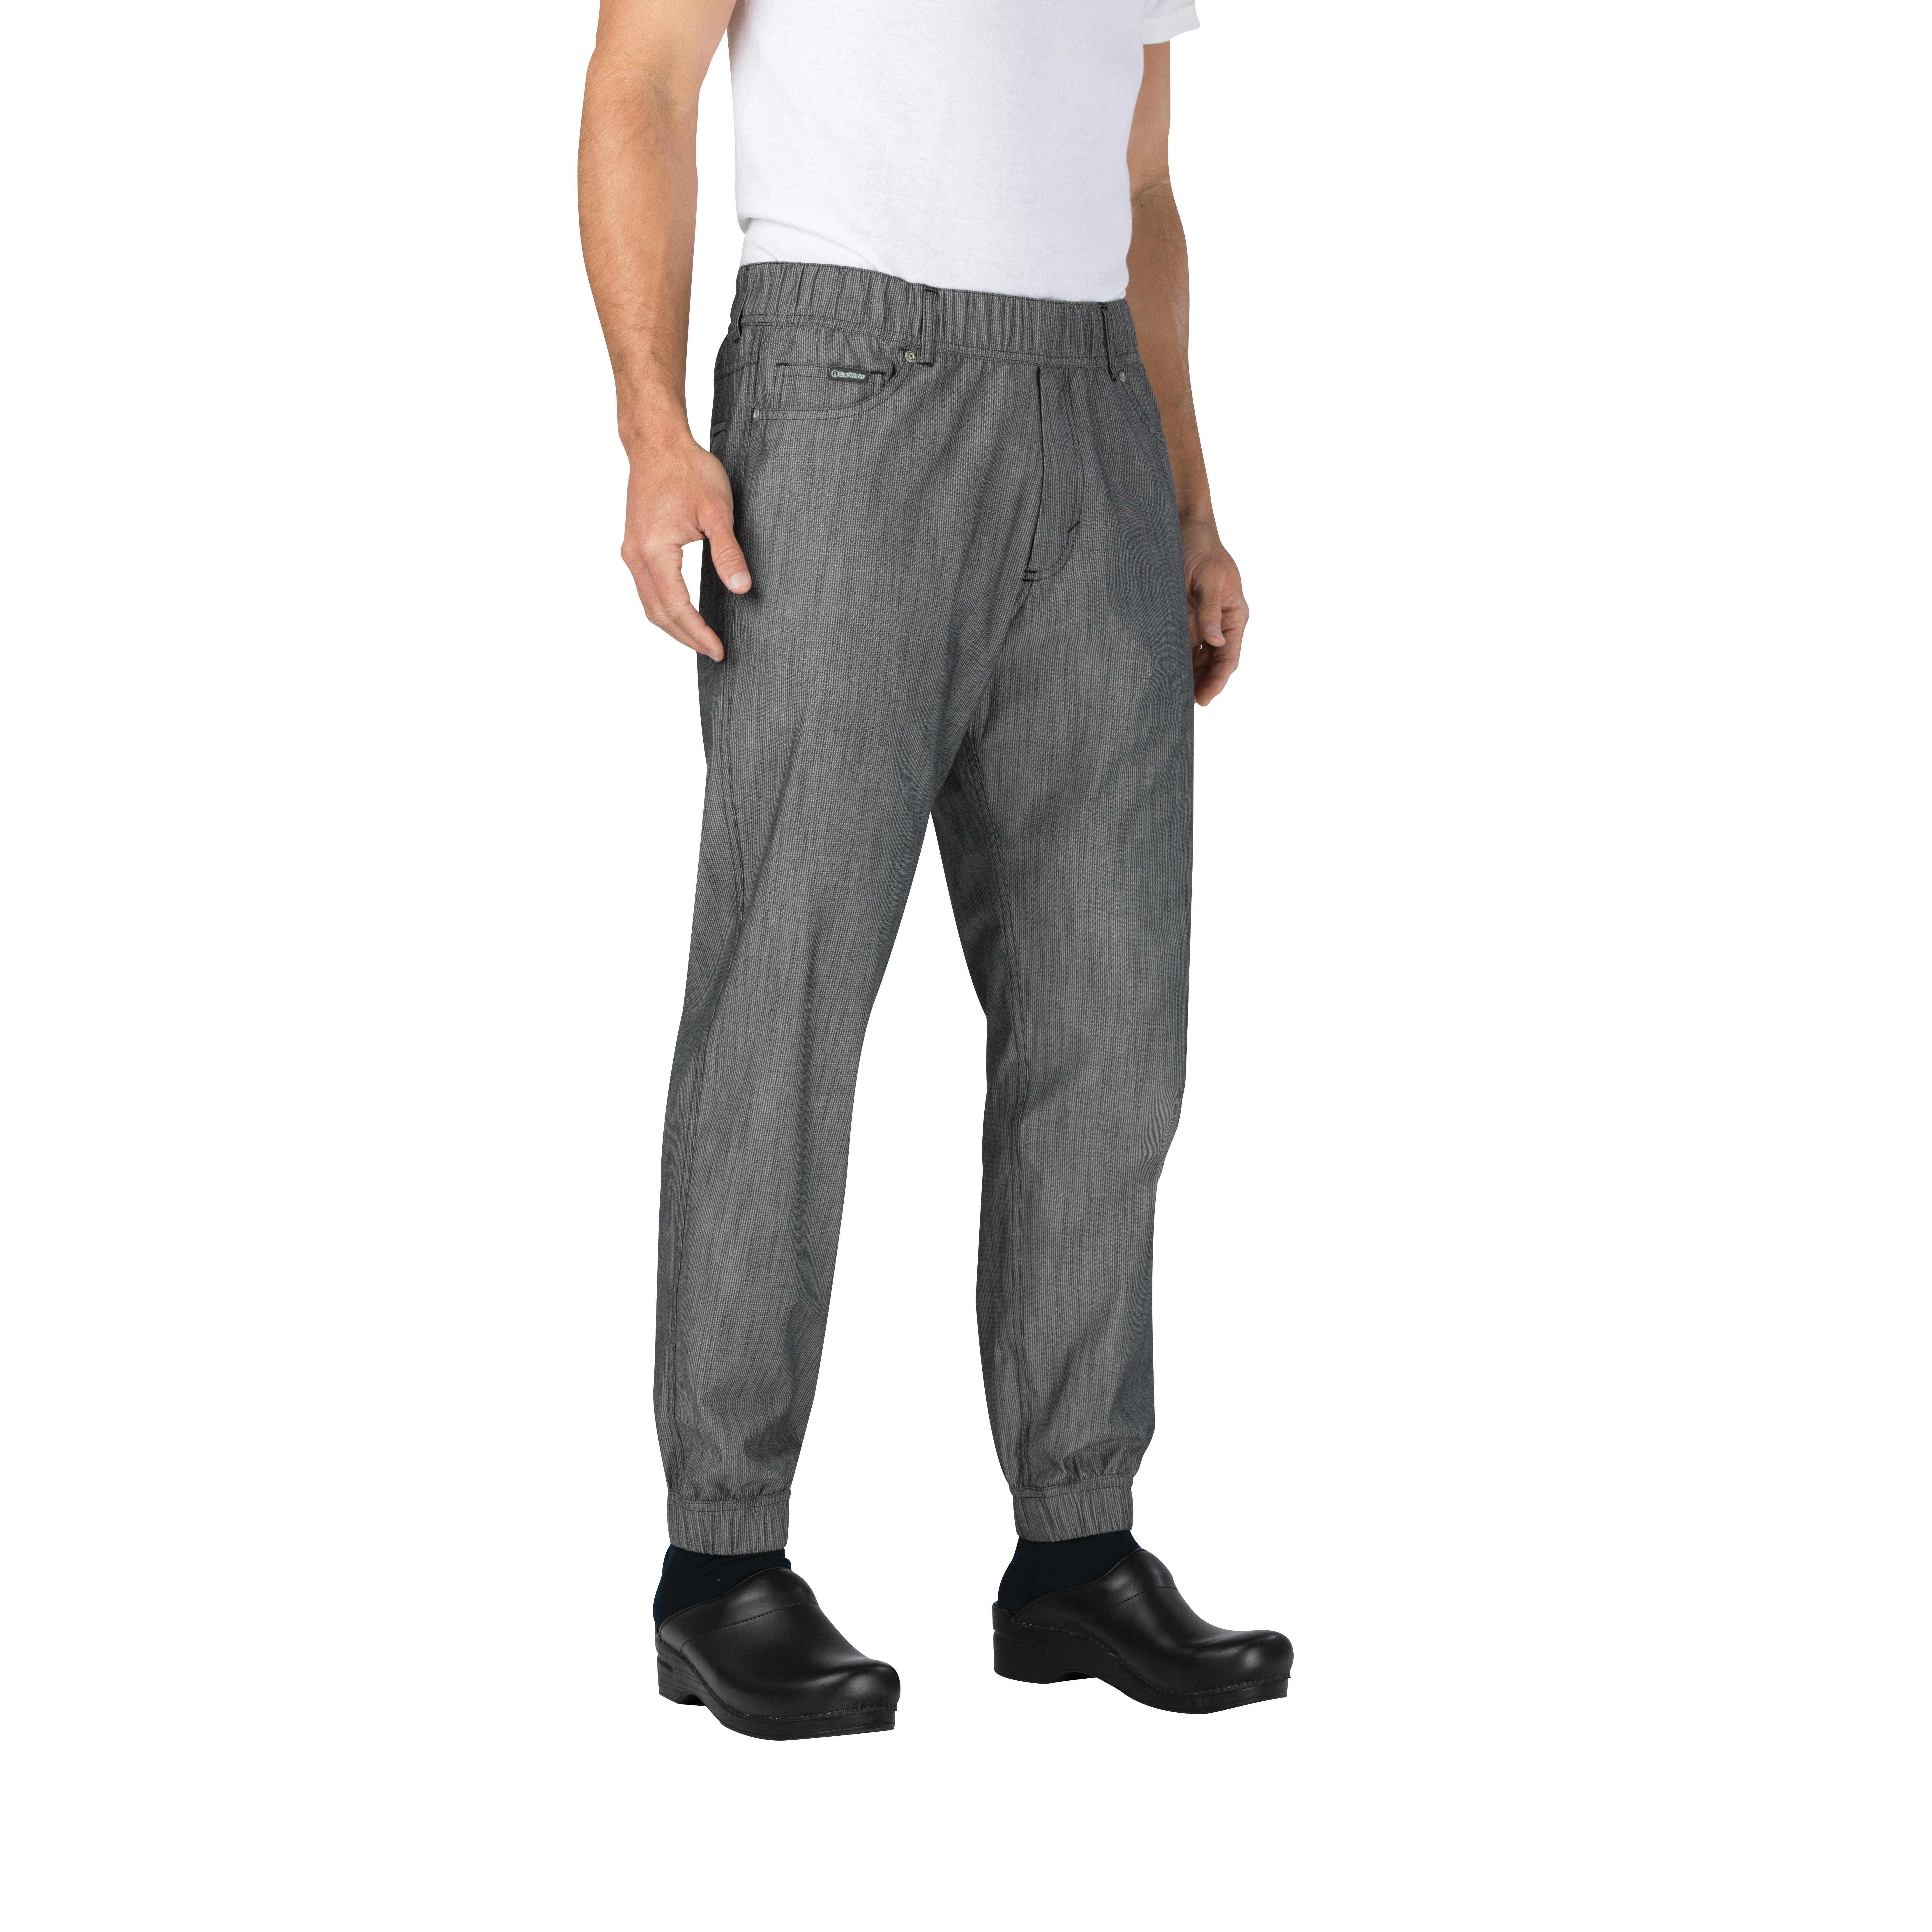 Chef Works PBE01BWS3XL chef's pants